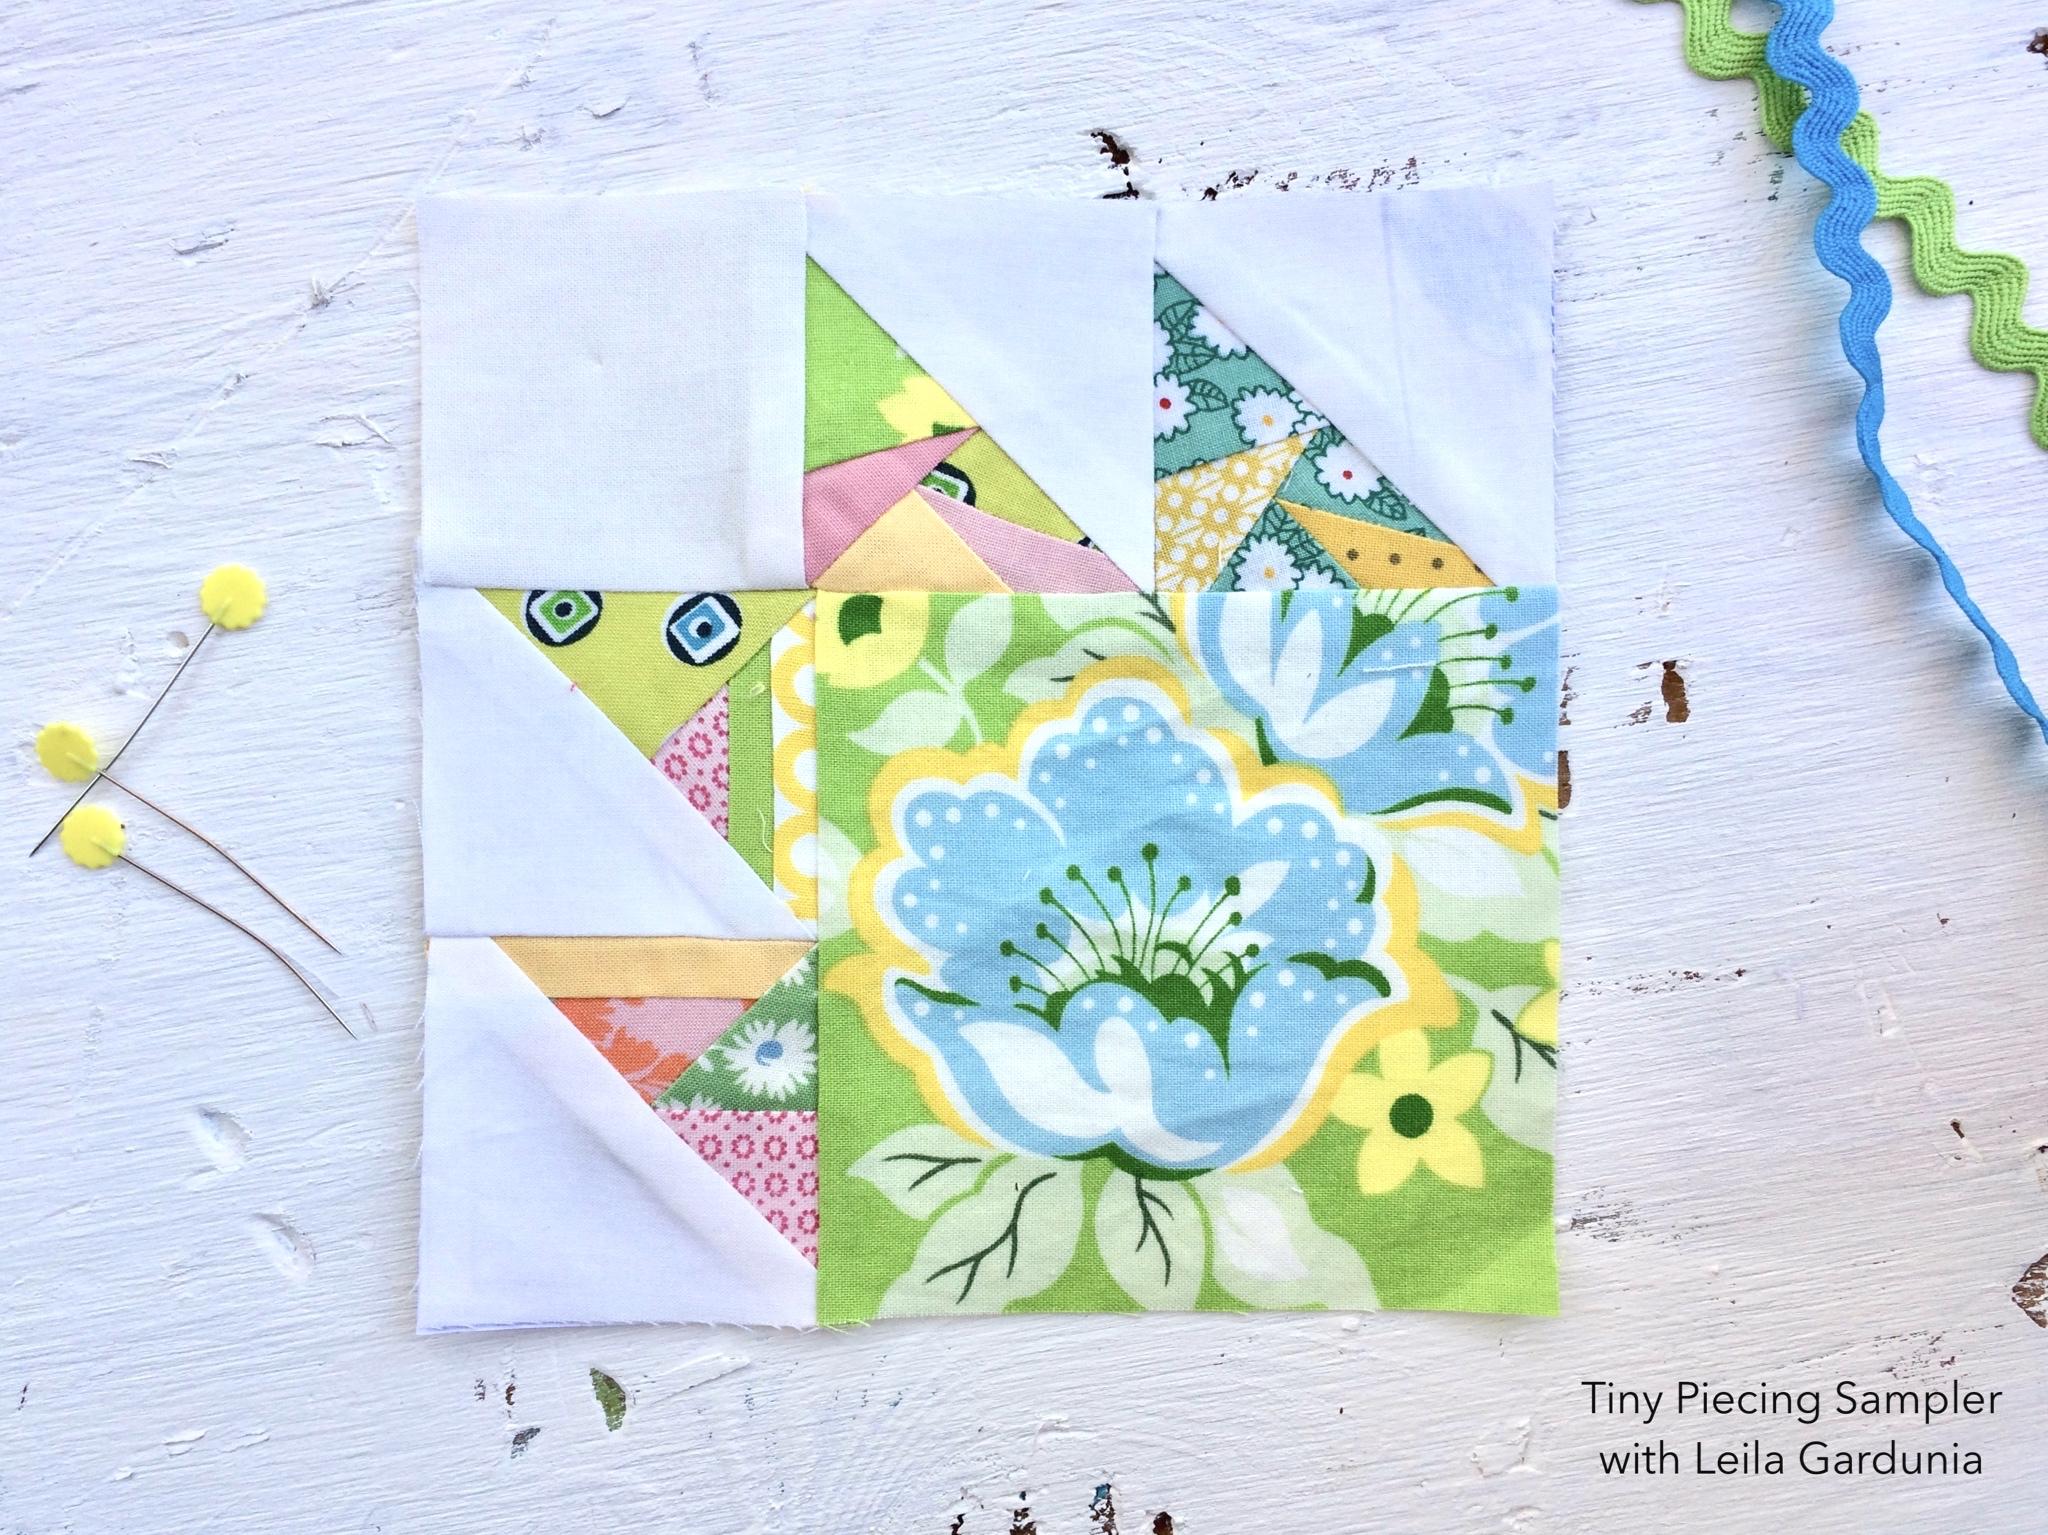 scrappy+triangle+quilt+block+green+blue.jpg